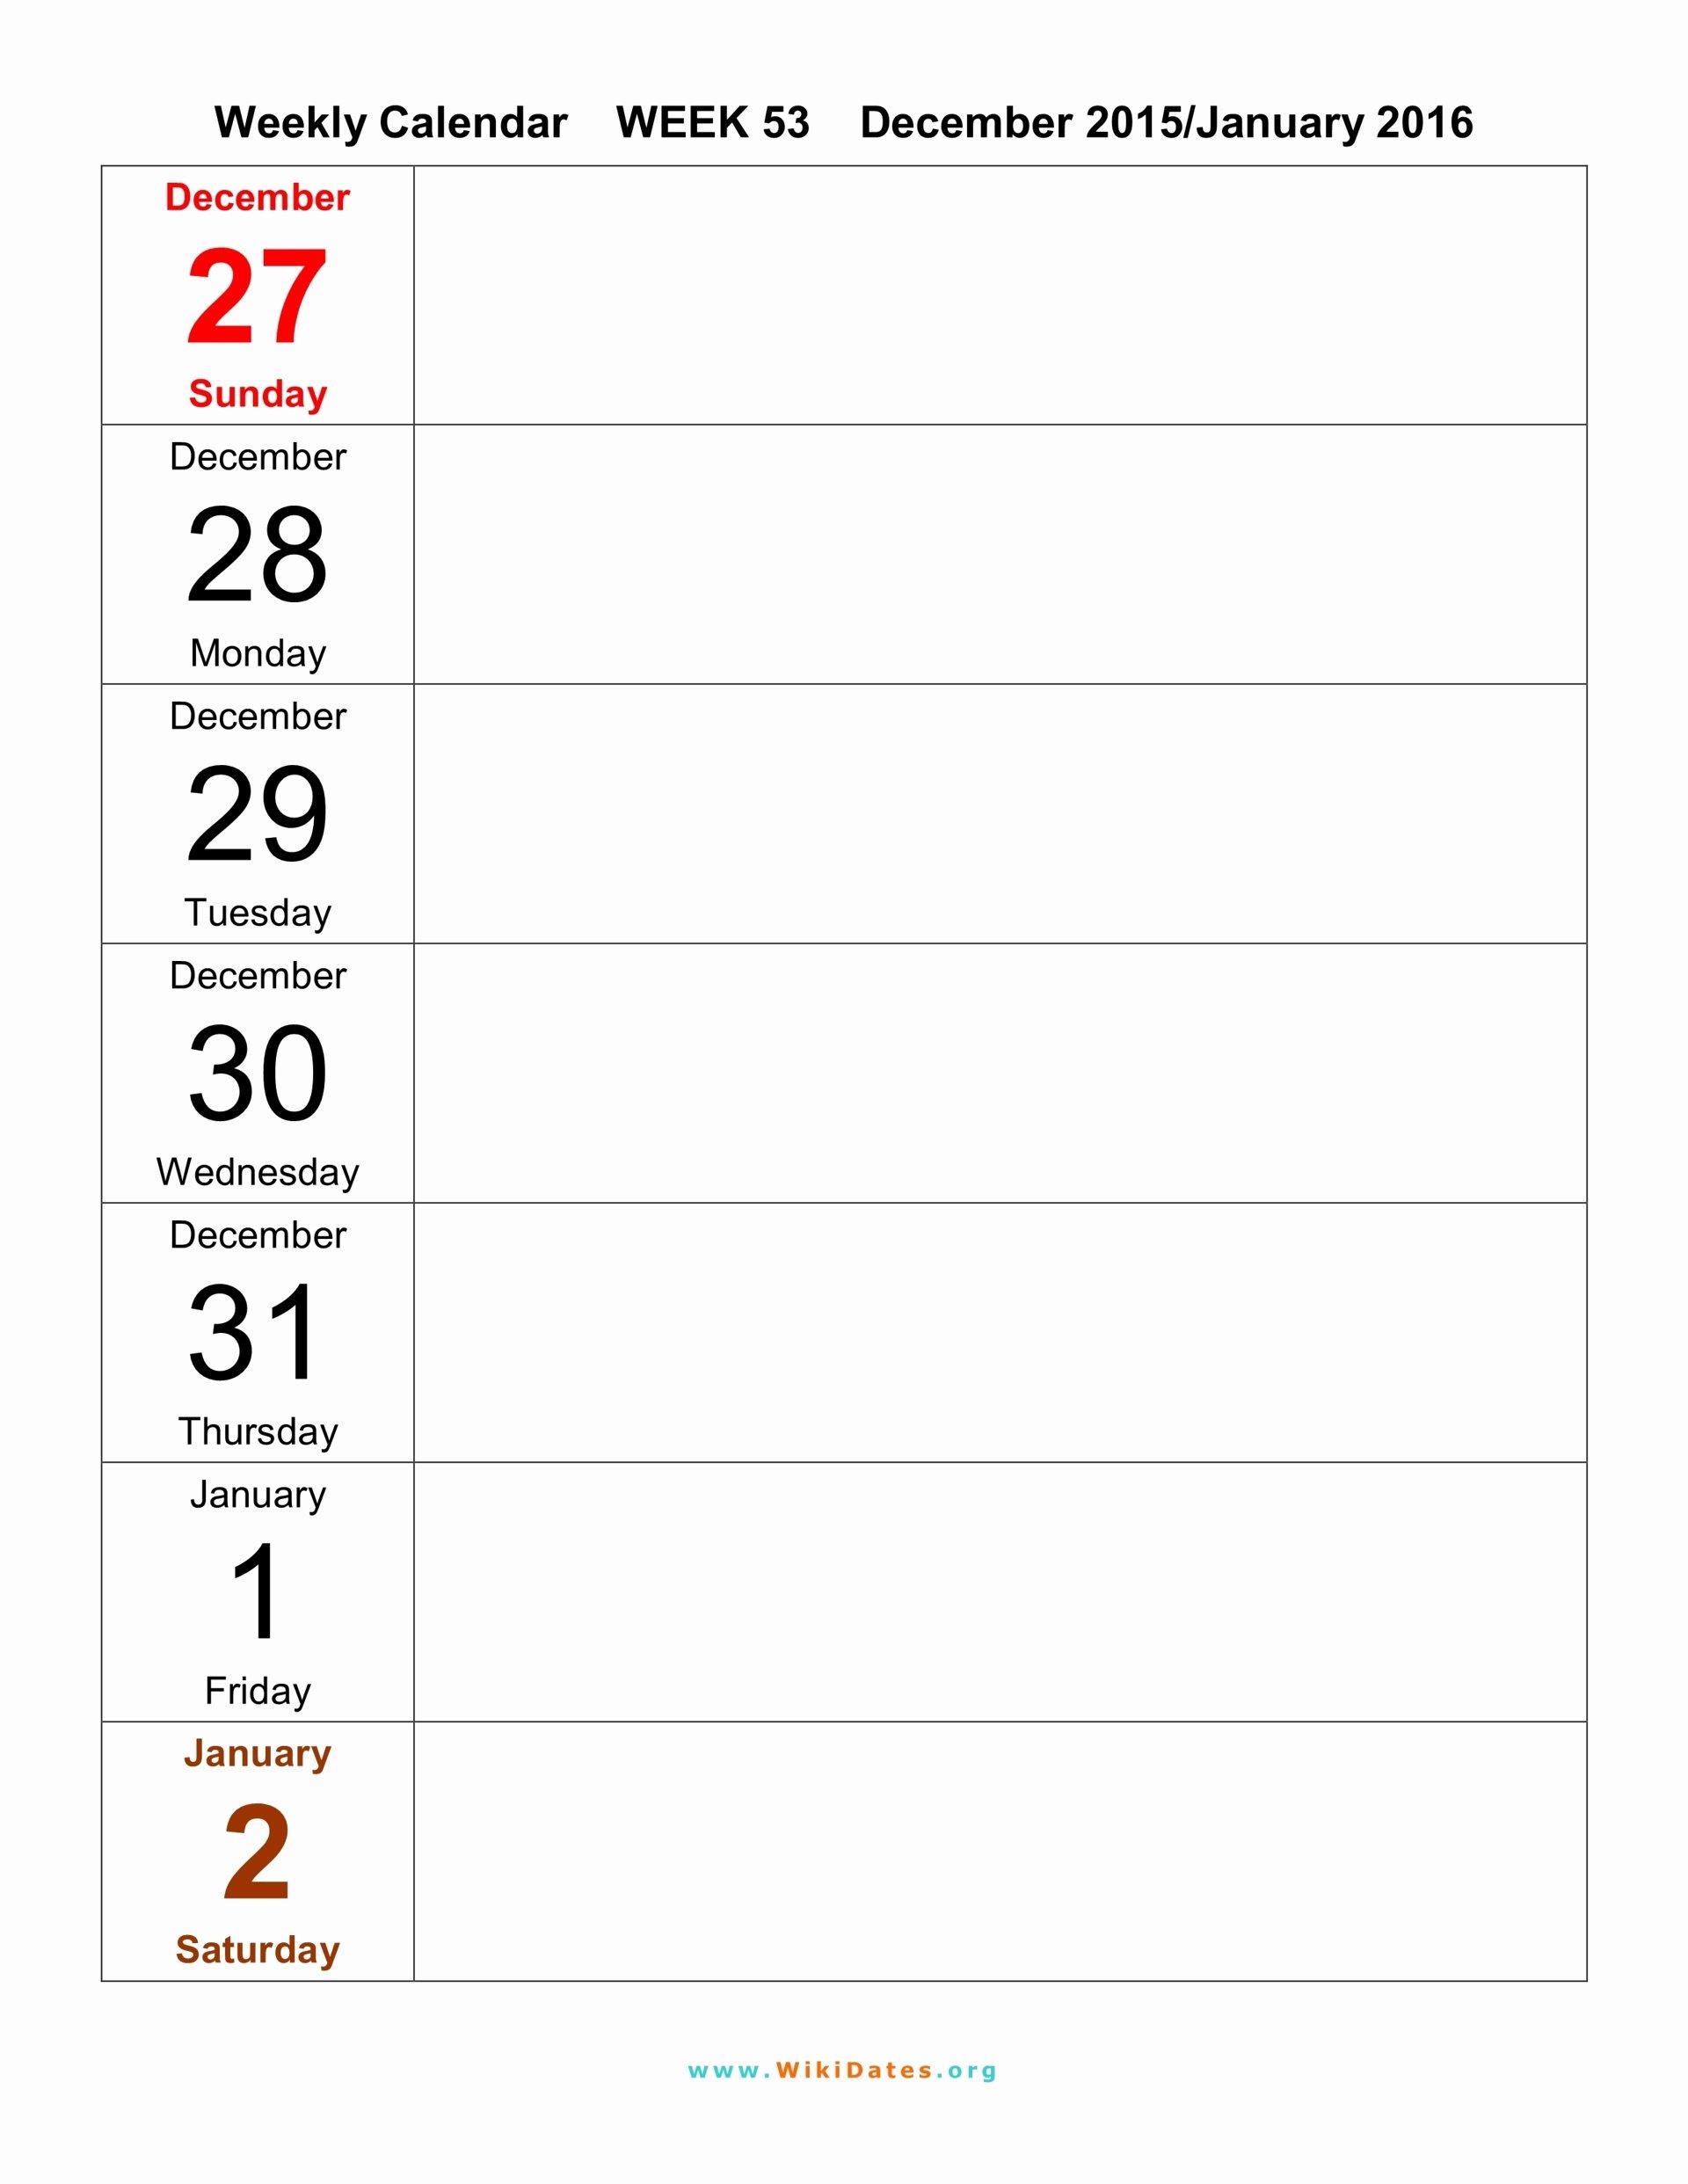 Weekly Calendar Template 2017 Fresh Weekly Calendar Template 2017